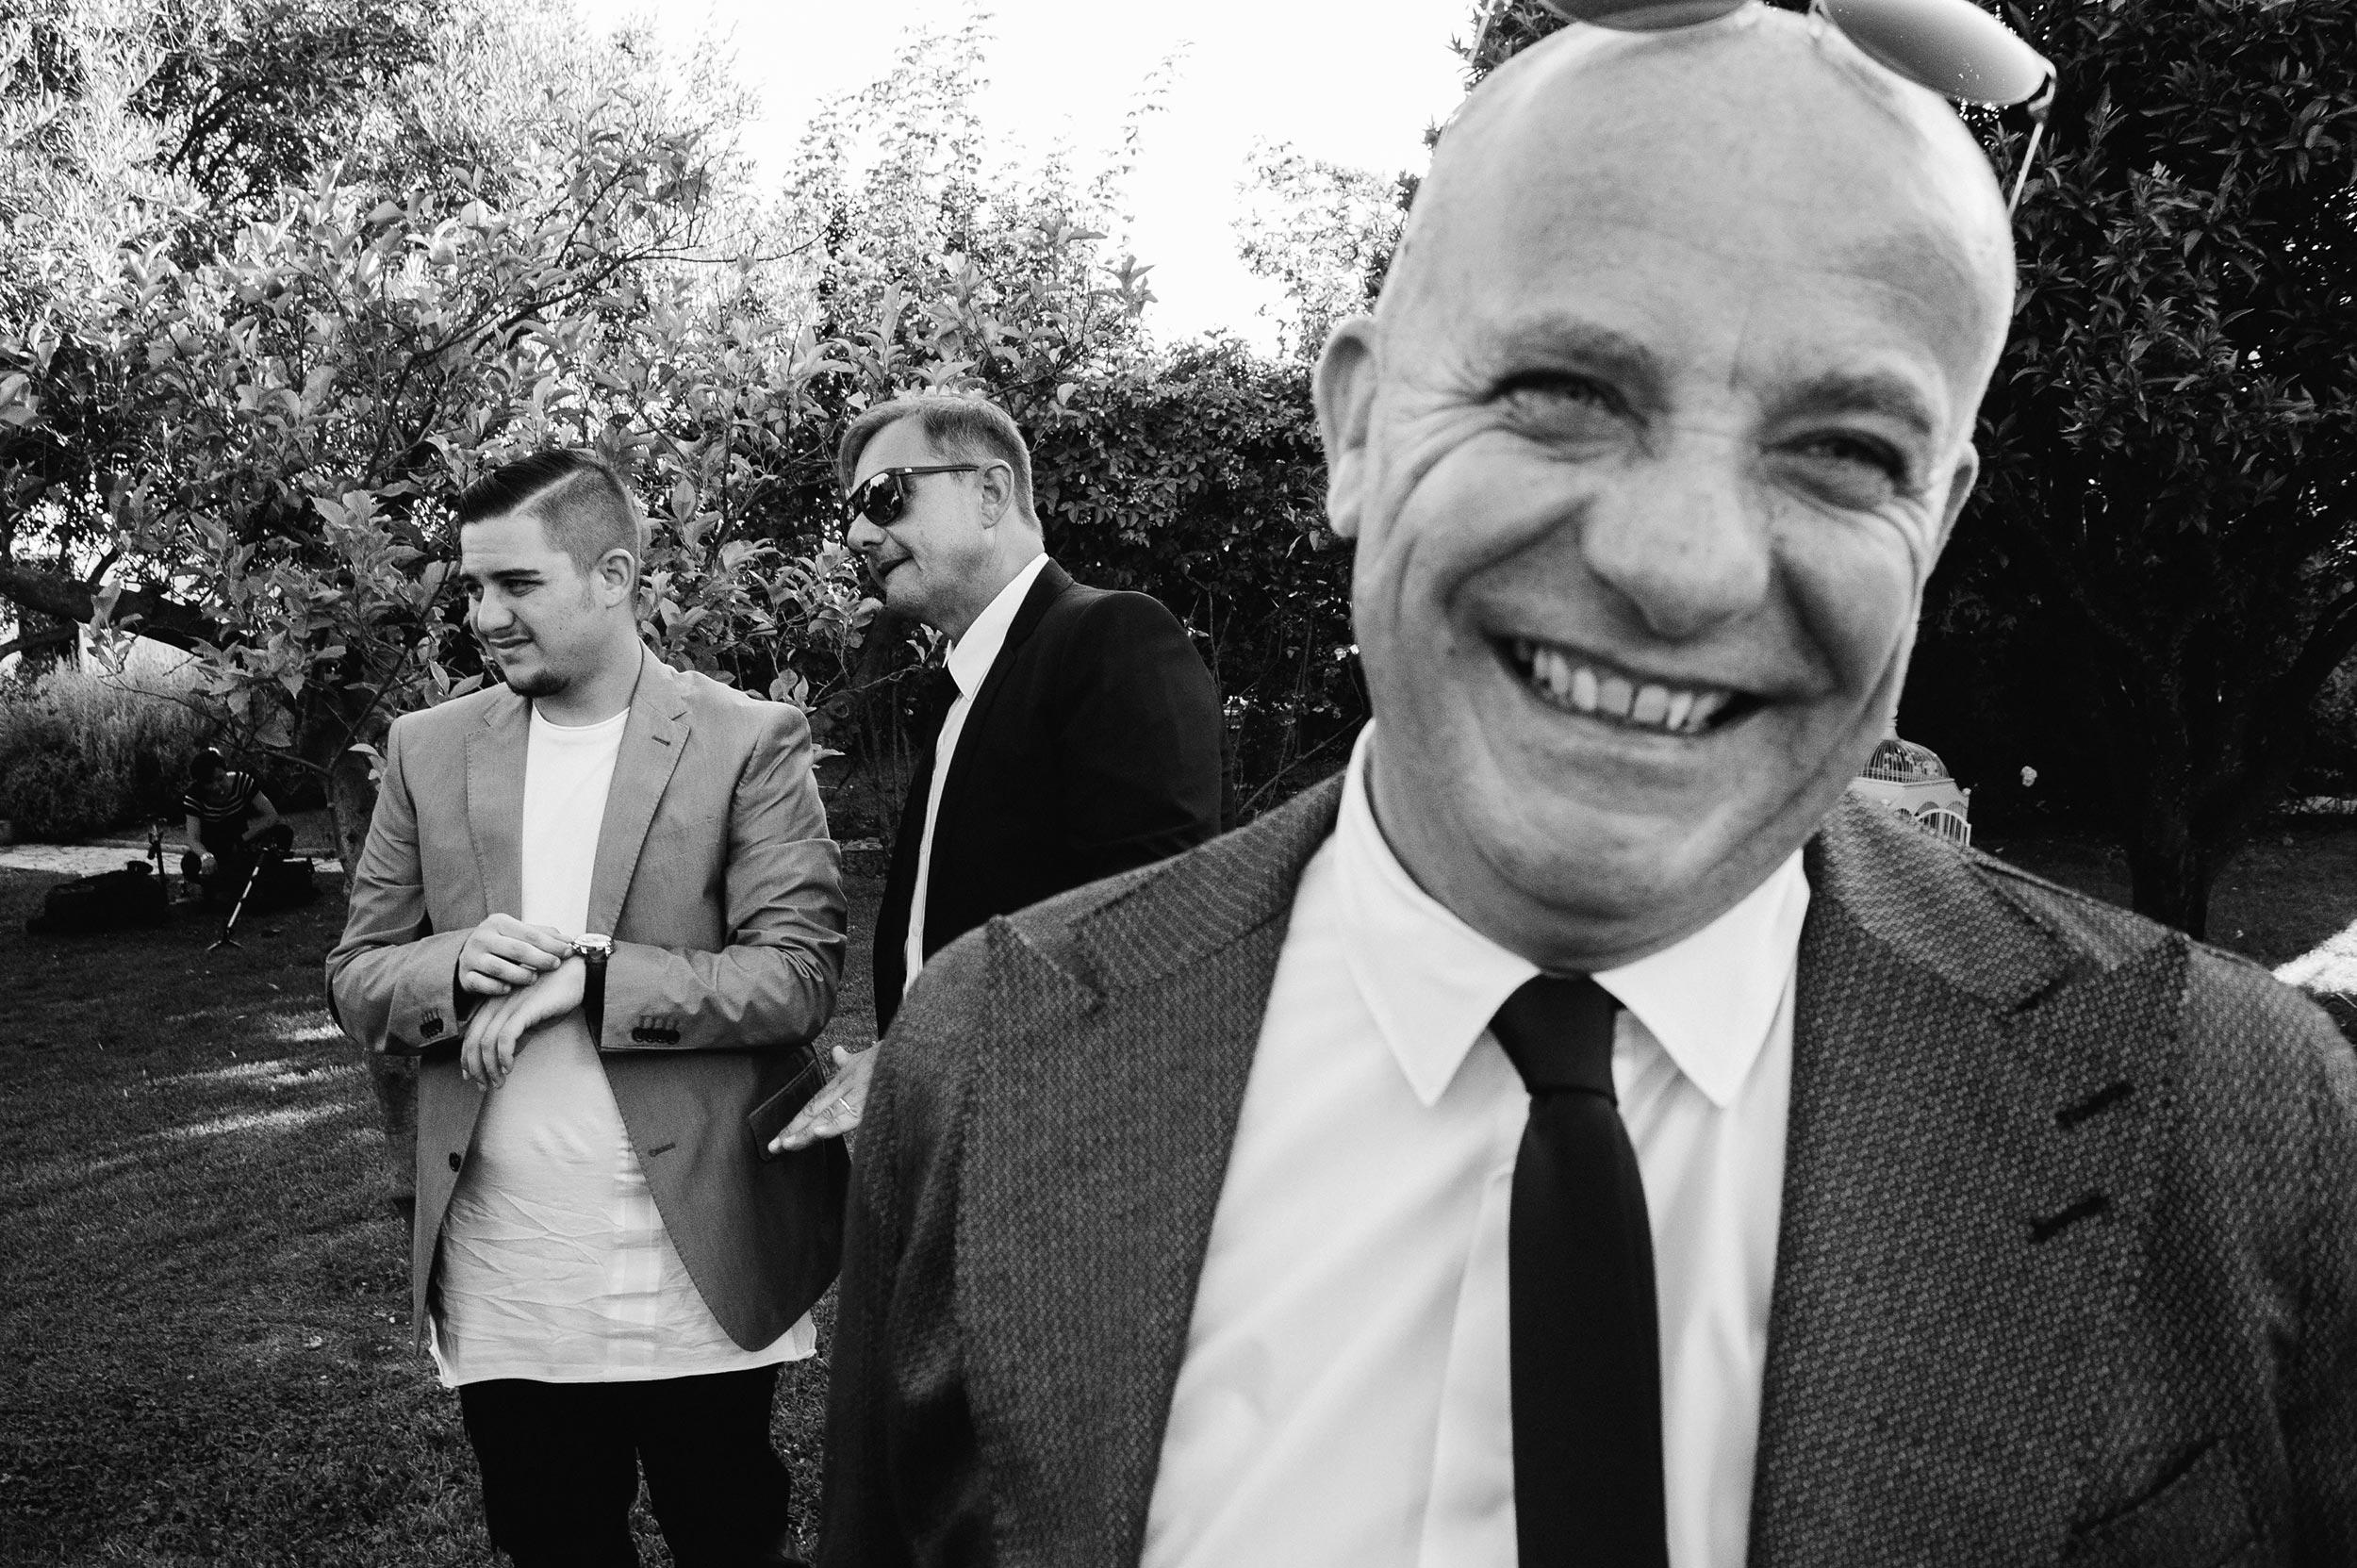 2016-Claudio-Teresa-Naples-Wedding-Photographer-Italy-Alessandro-Avenali-73.jpg